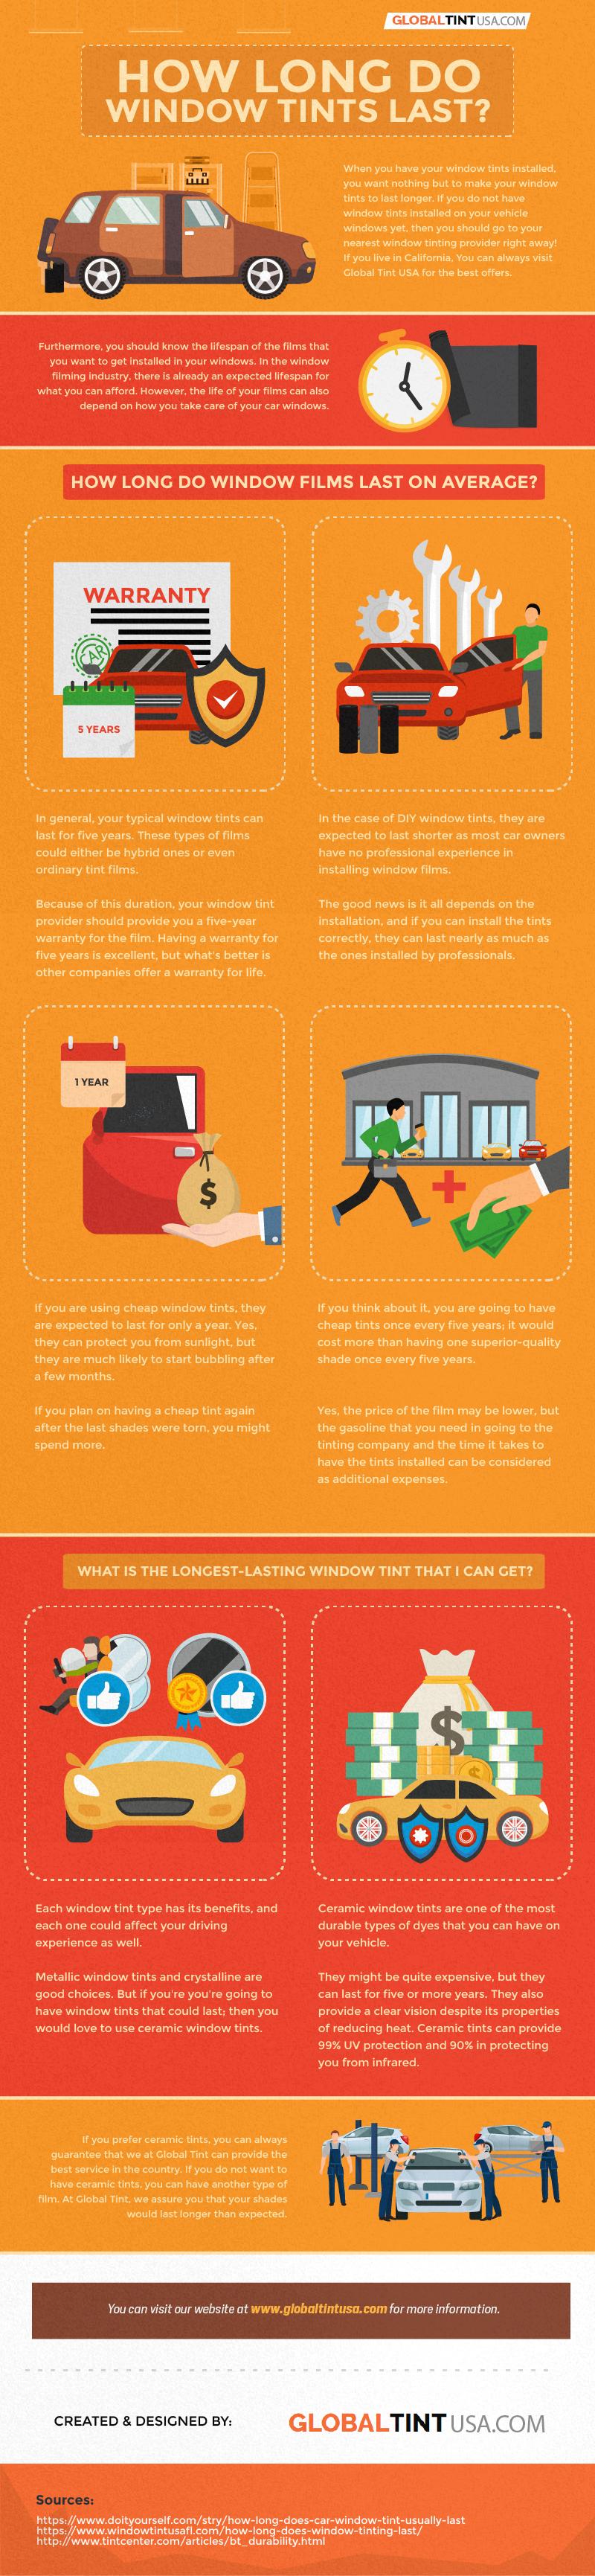 Infographic: How long do Window Tints last? | Global Tint USA